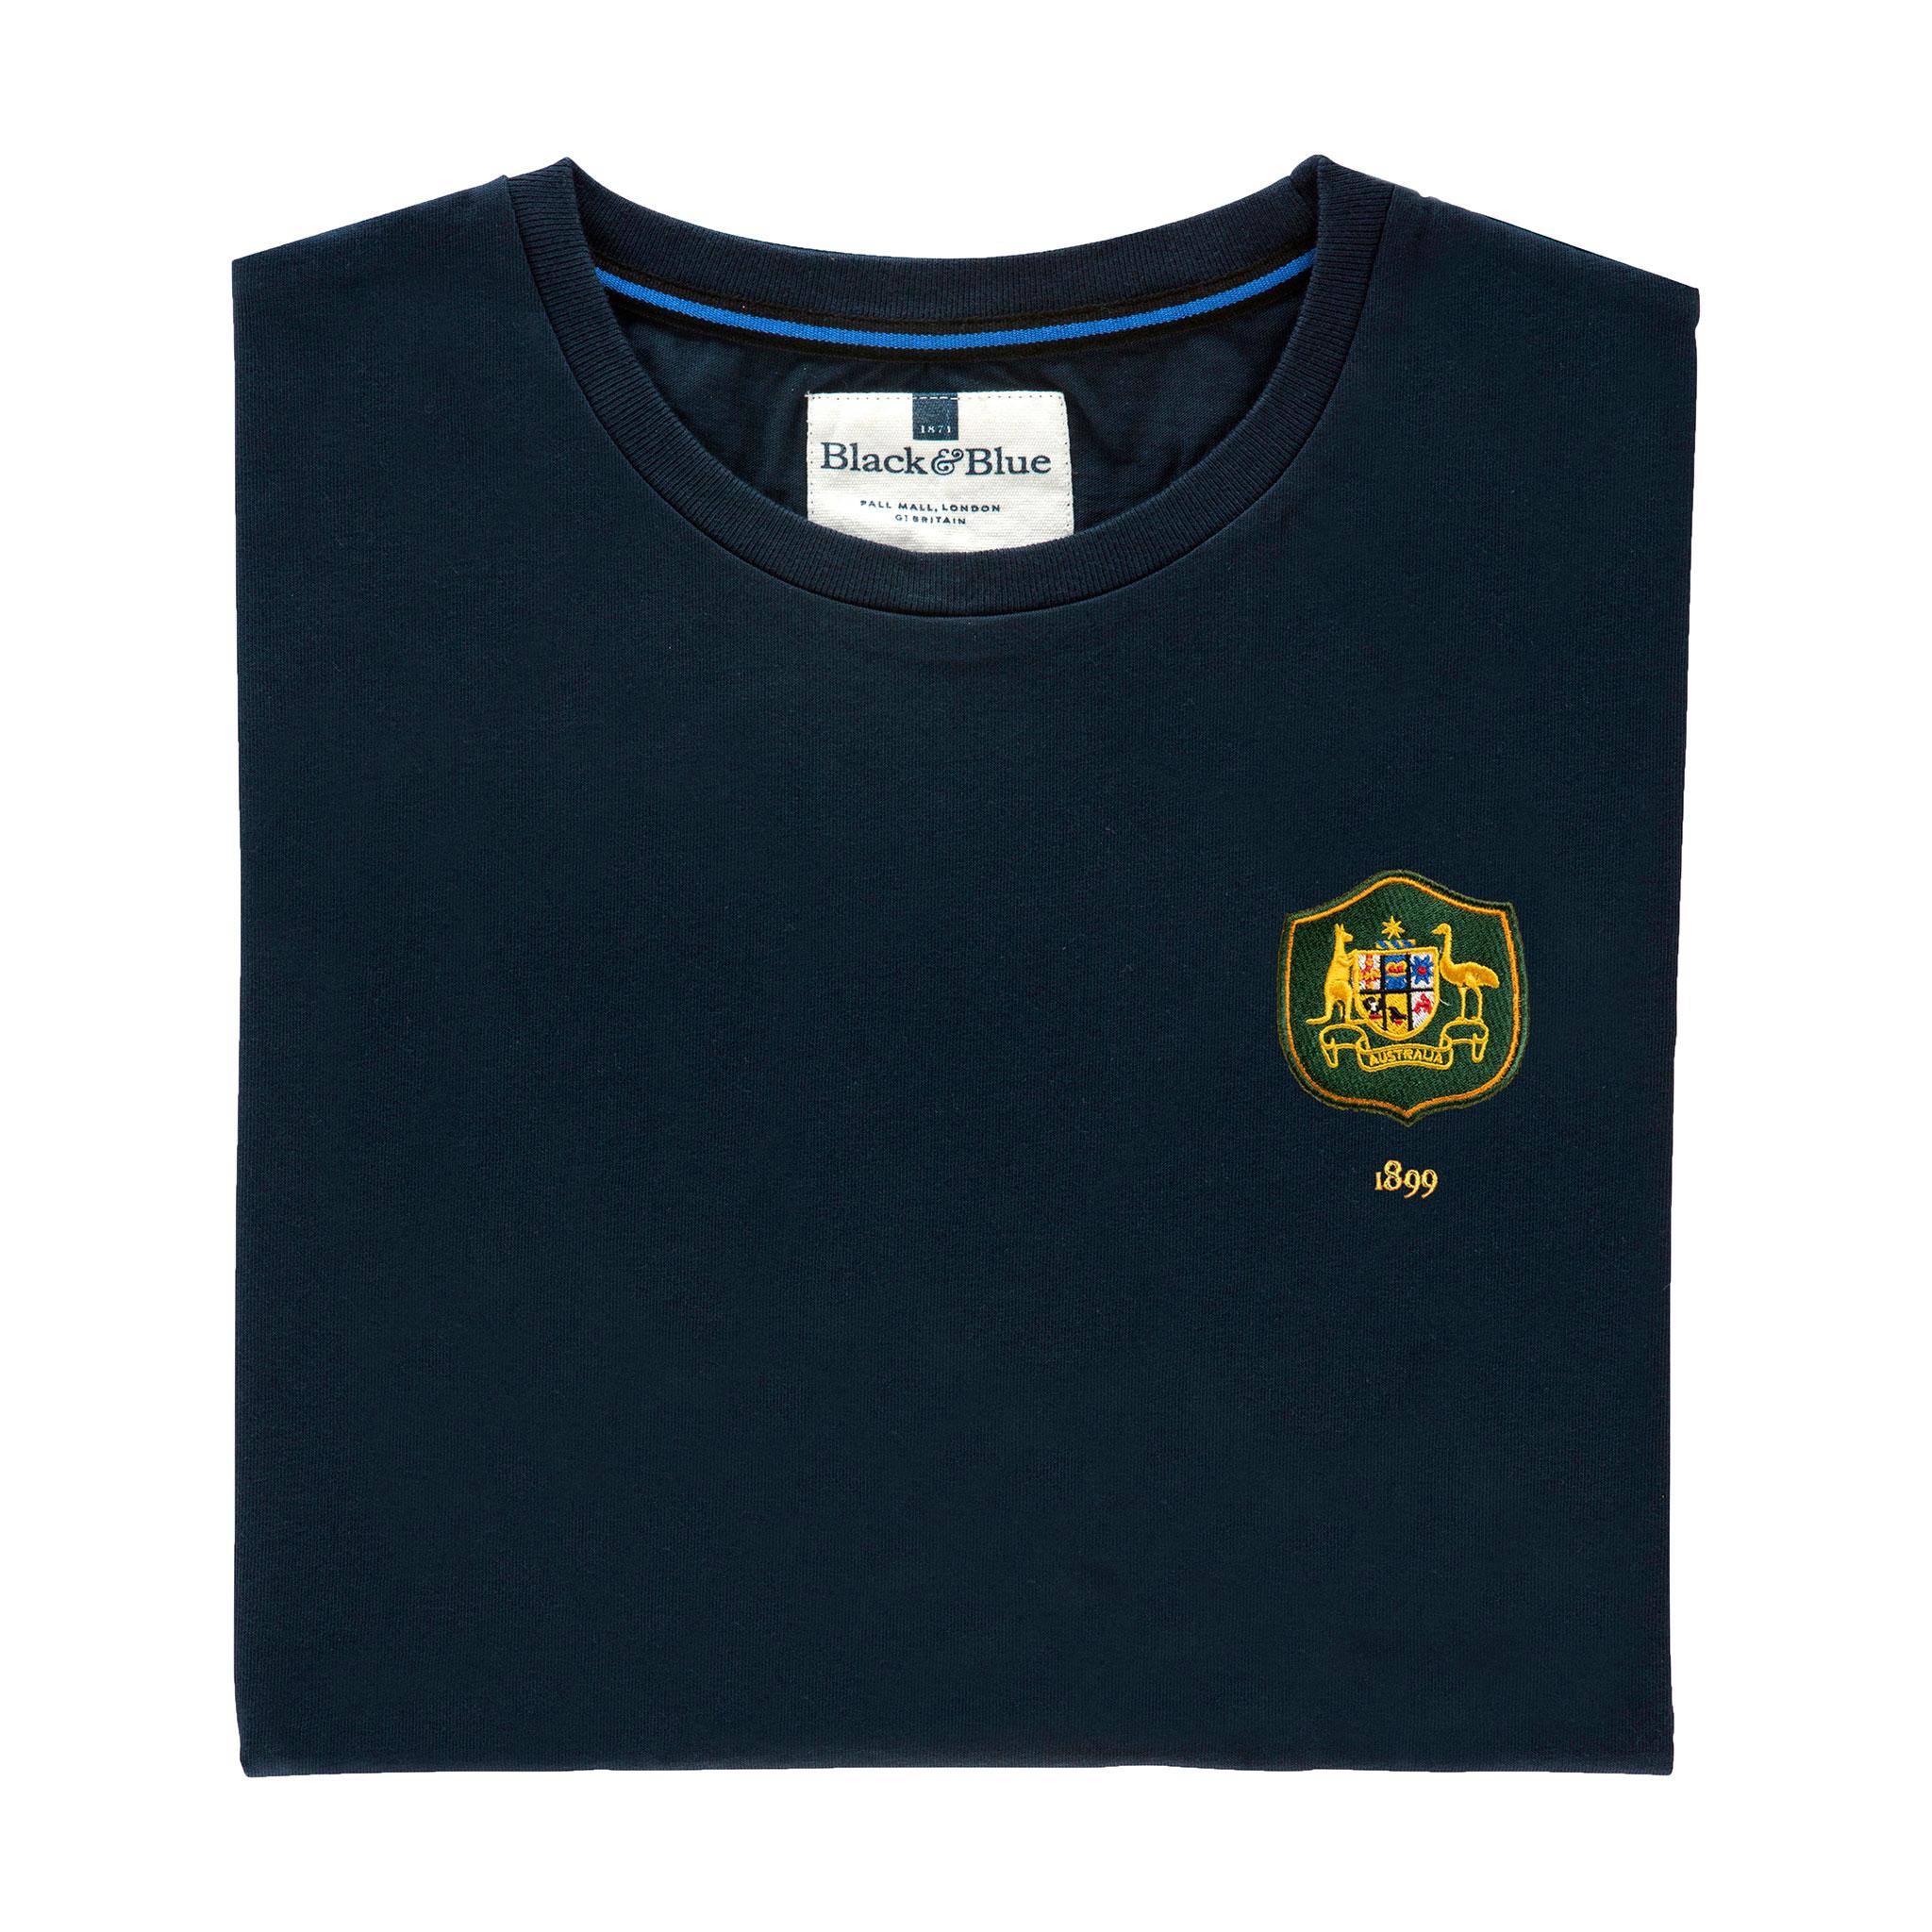 Australia 1899 Navy T-Shirt_Folded